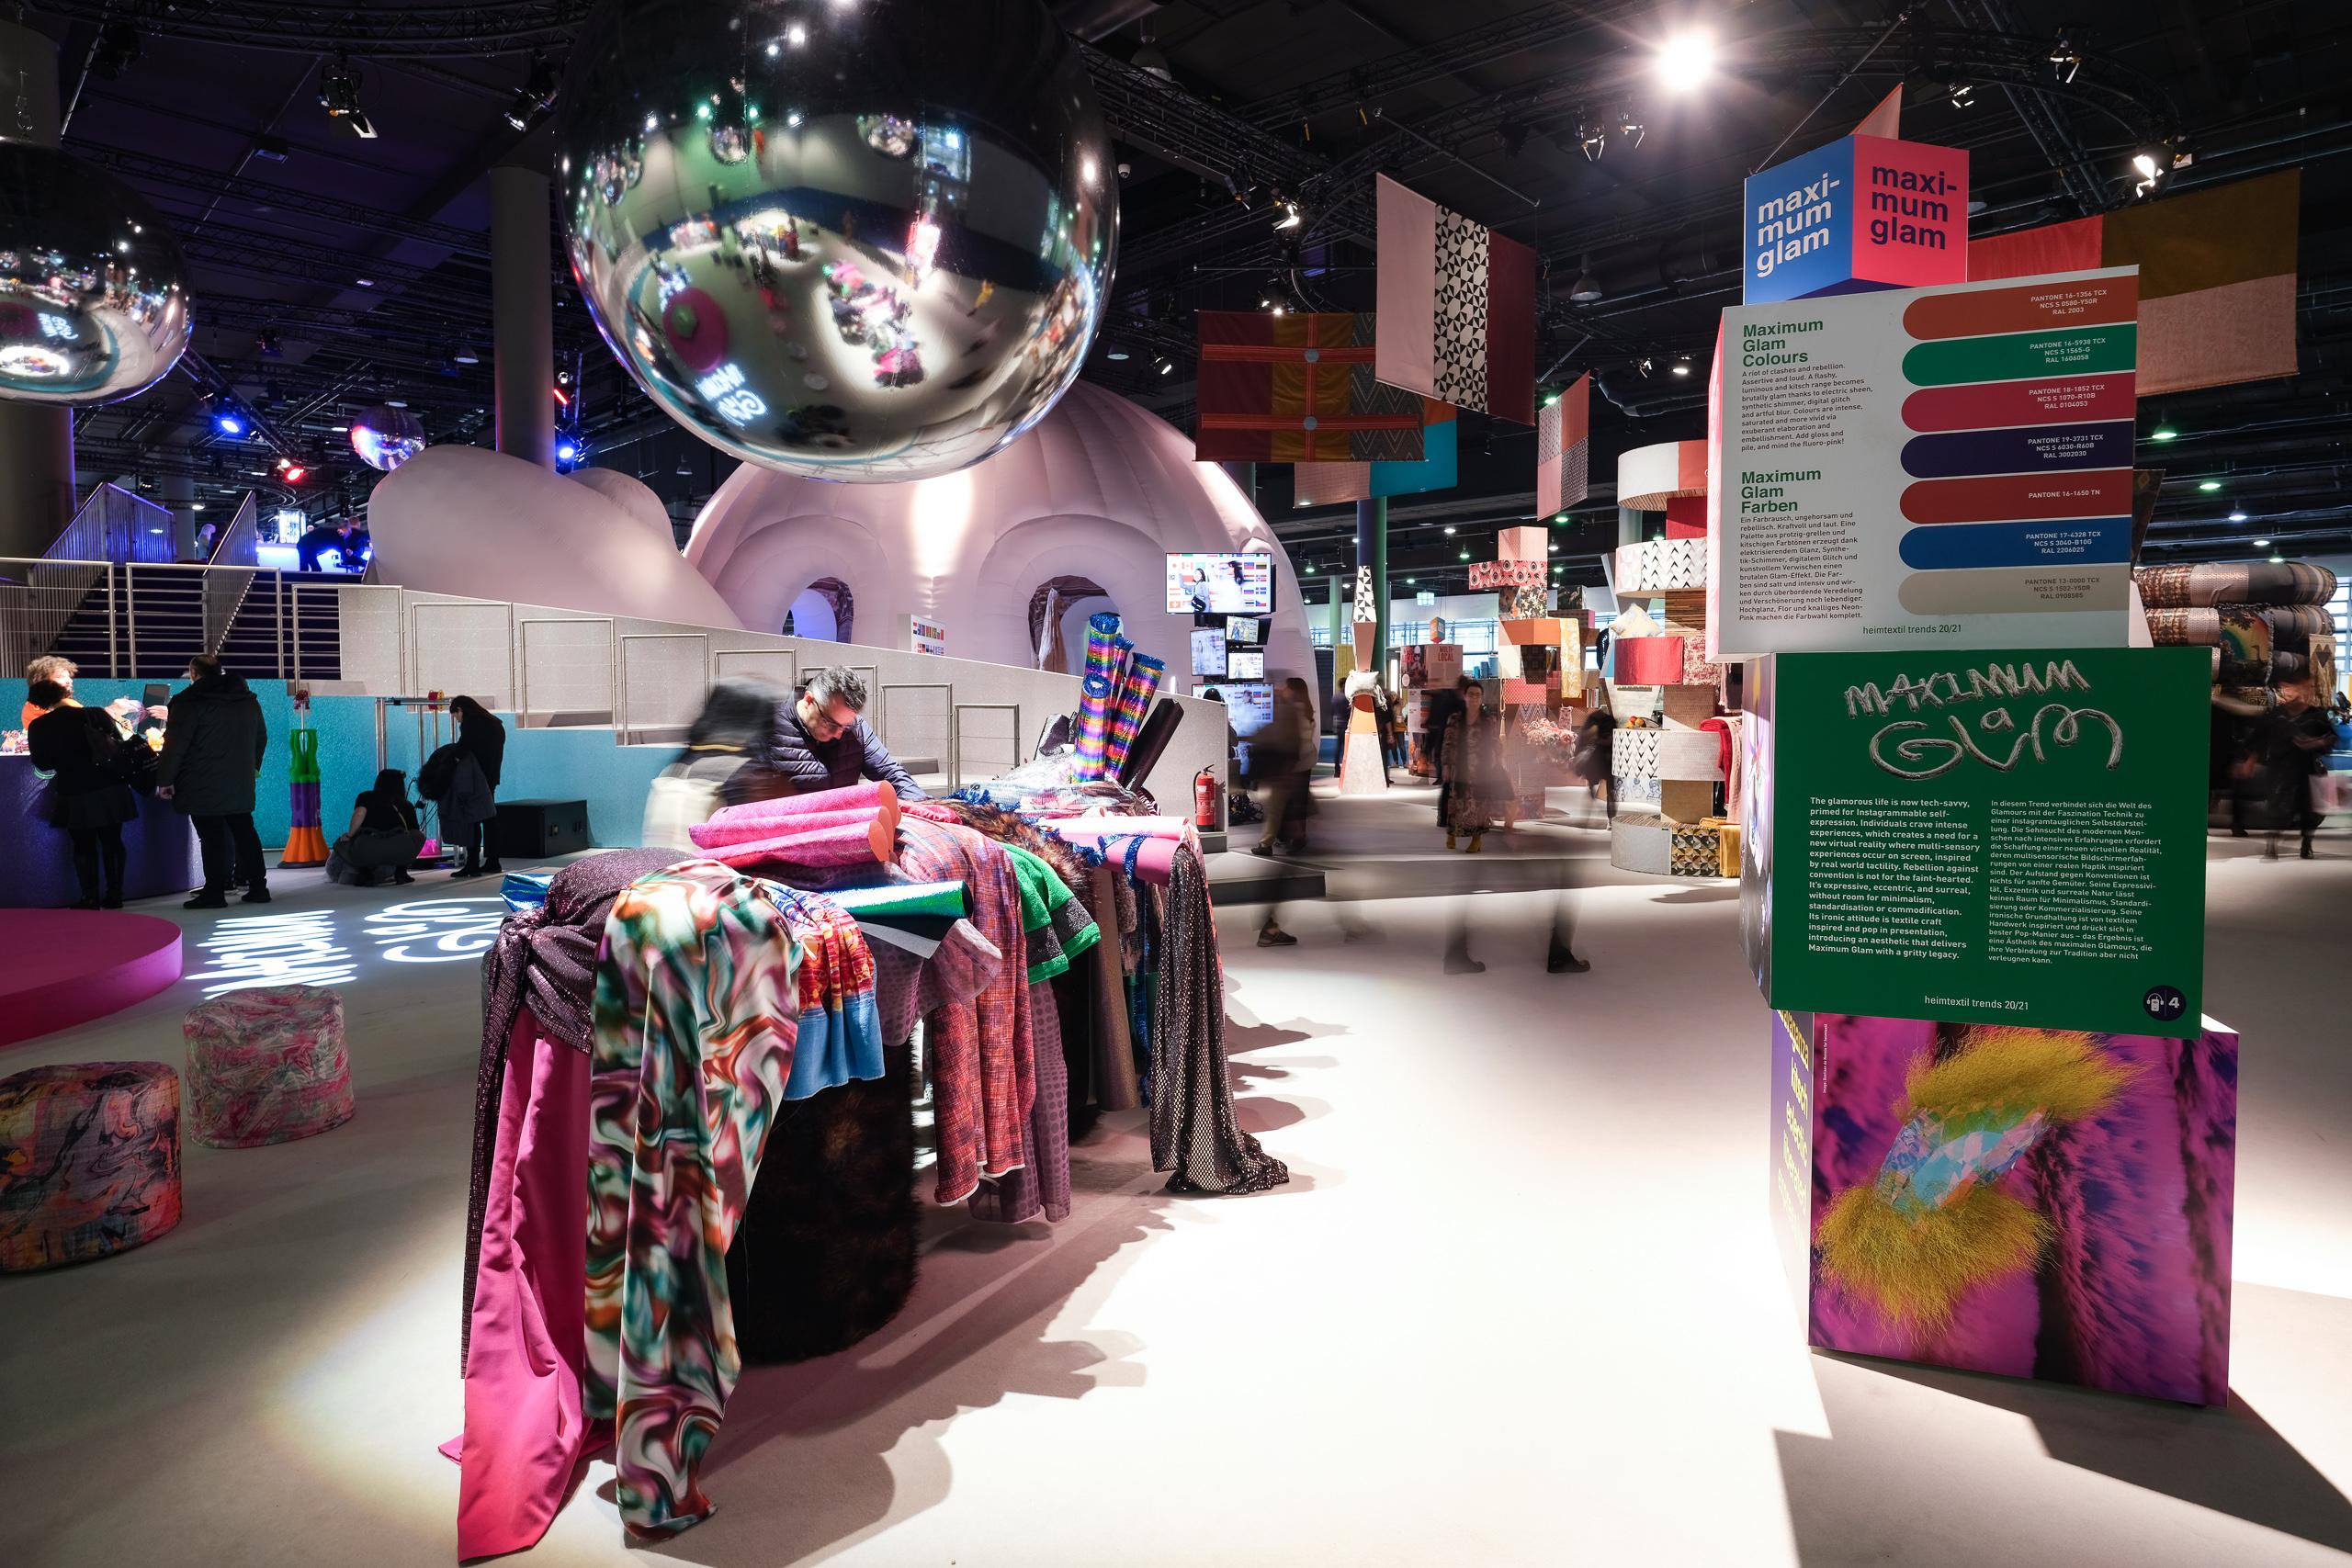 Foto Pietro Sutera. Stand Maximum Glam amenajat la Heimtextil Frankfurt, unde au fost prezentate materiale textile inovatoare.